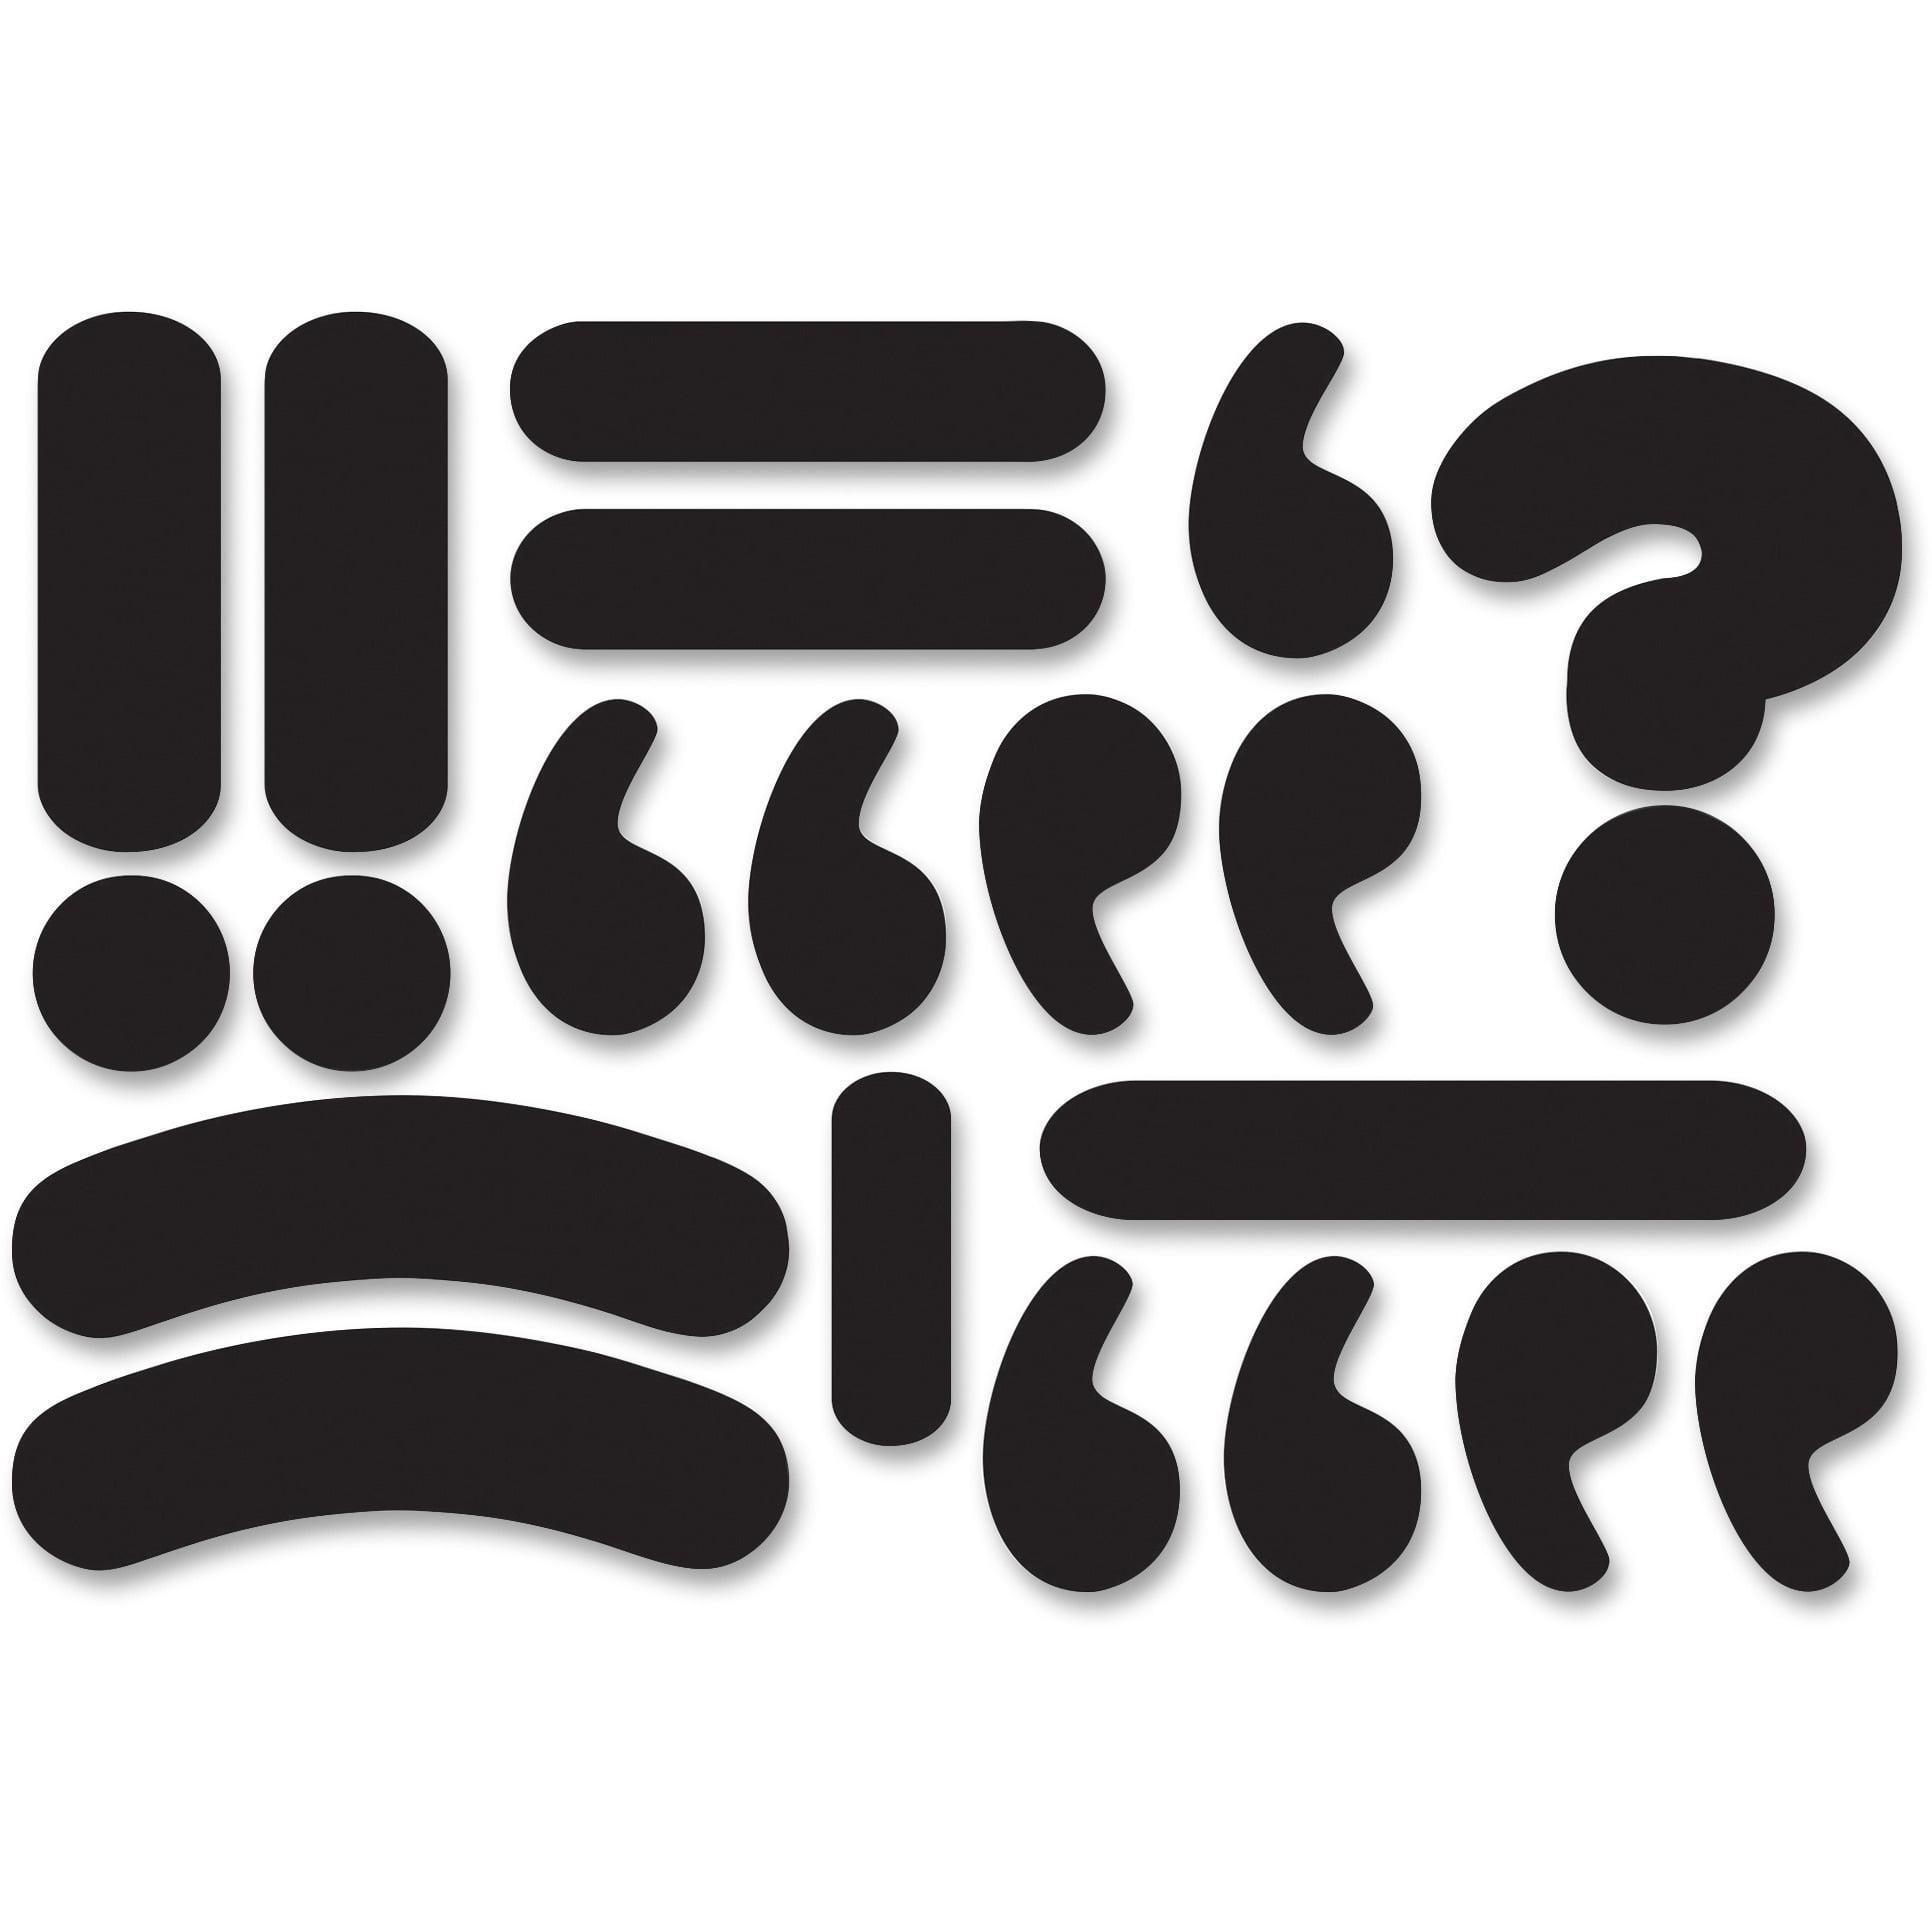 Ashley, ASH10099, Magnetic Die-cut Punctuation Marks, 1 Set